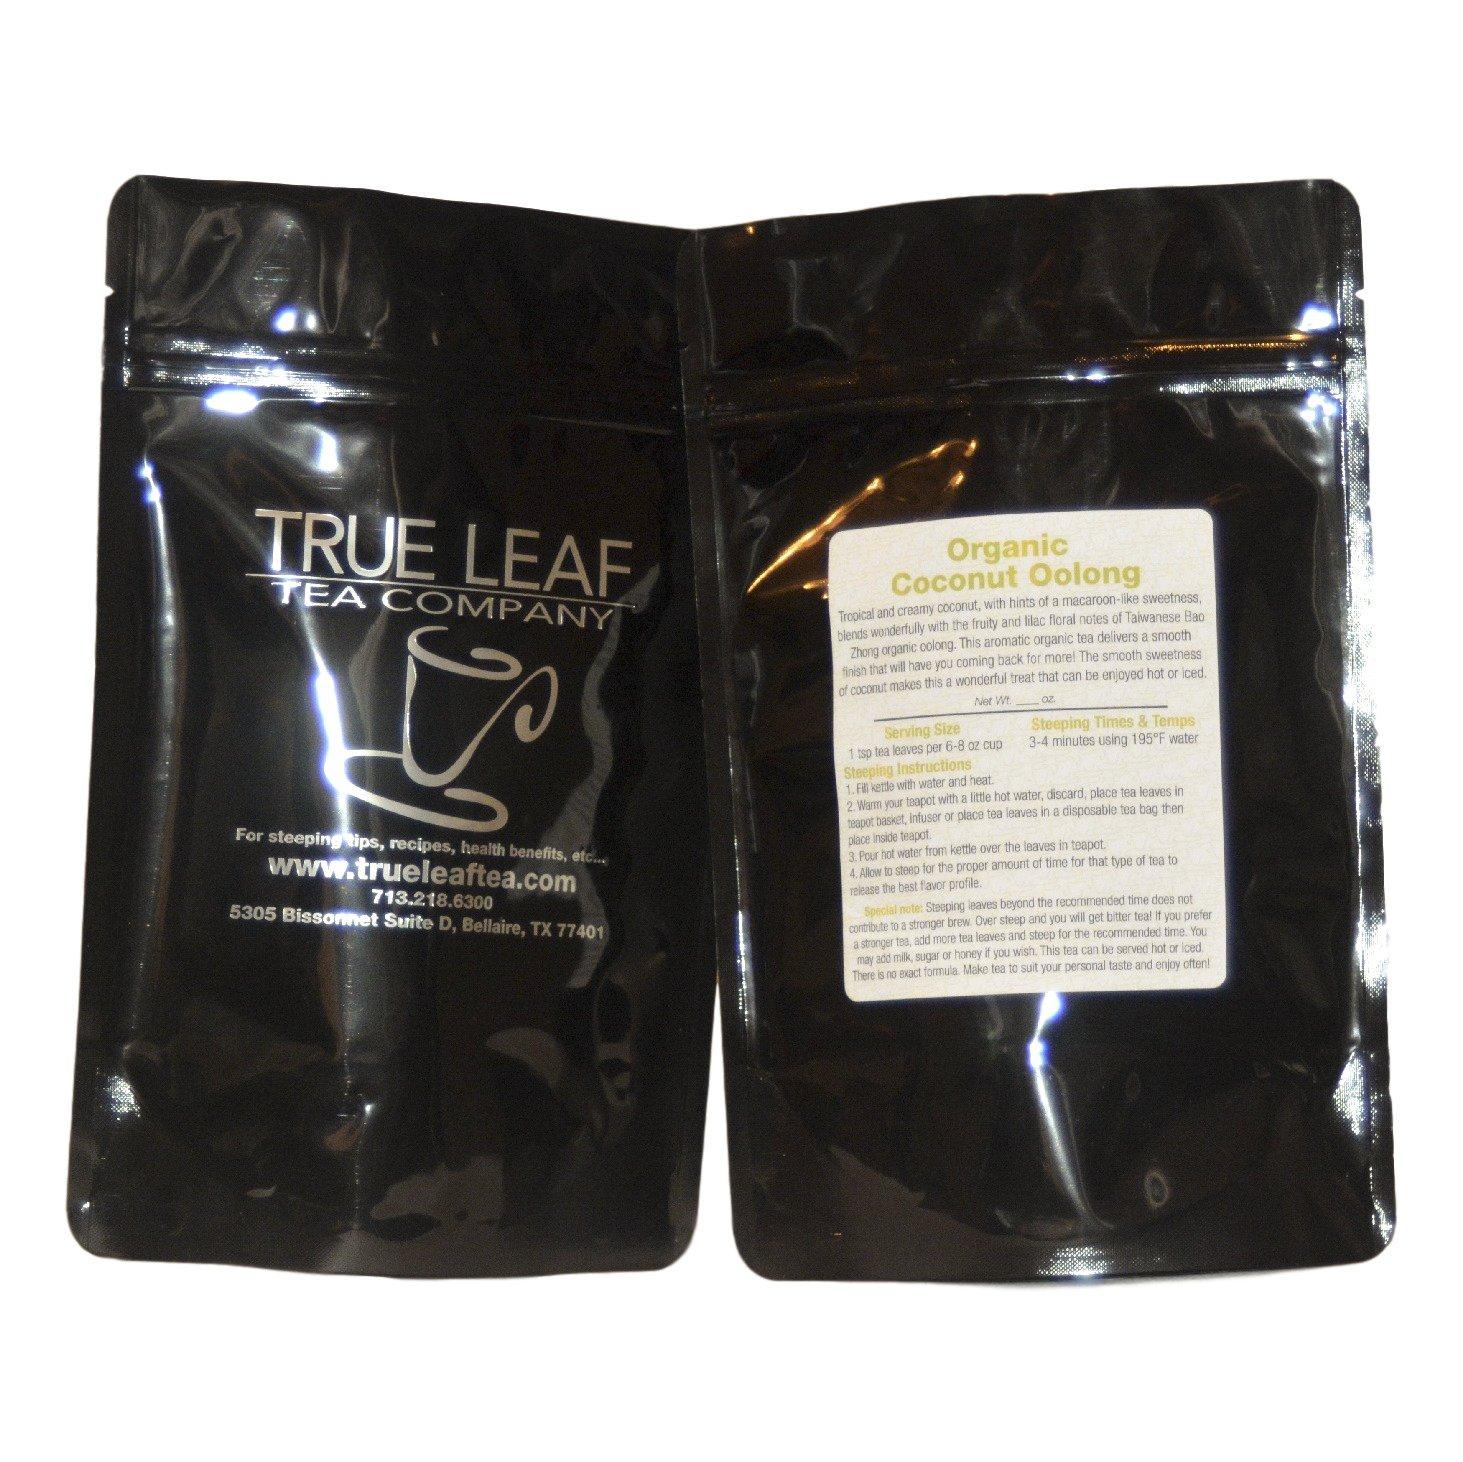 True Leaf Tea Organic Coconut Oolong Tea 8 OZ